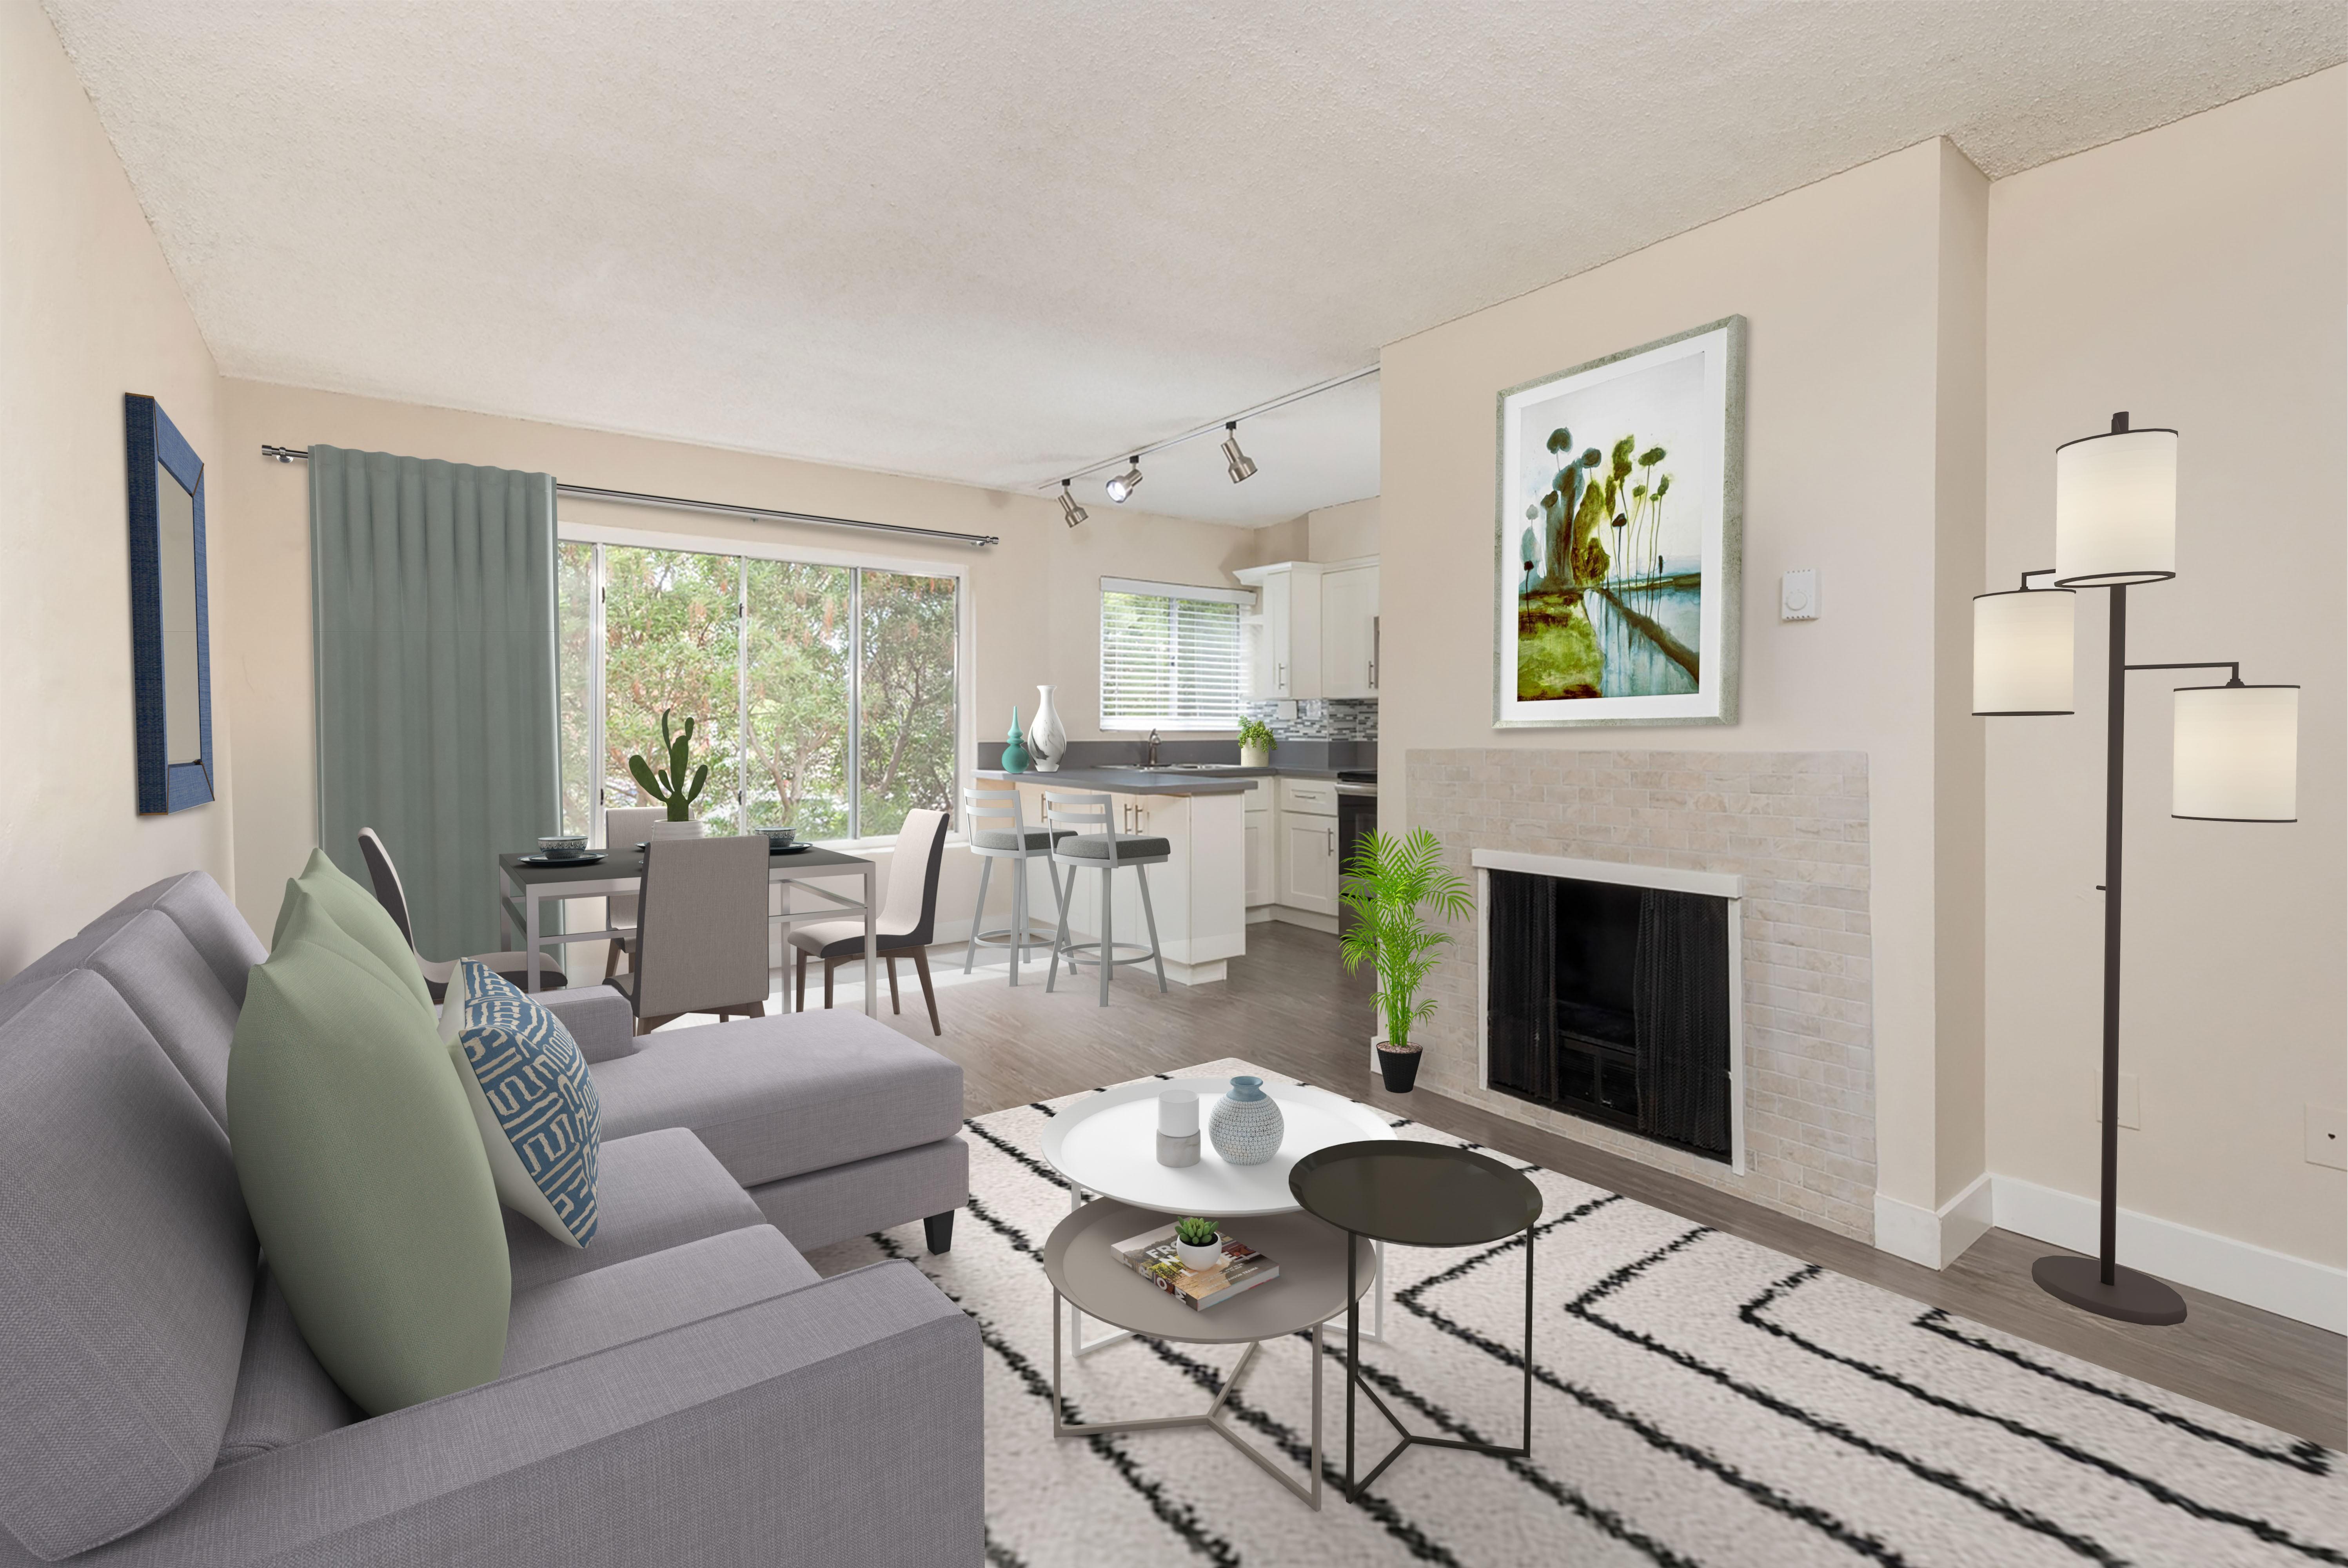 Apartments Near Los Angeles Playa Pacifica Apartments for Los Angeles Students in Los Angeles, CA